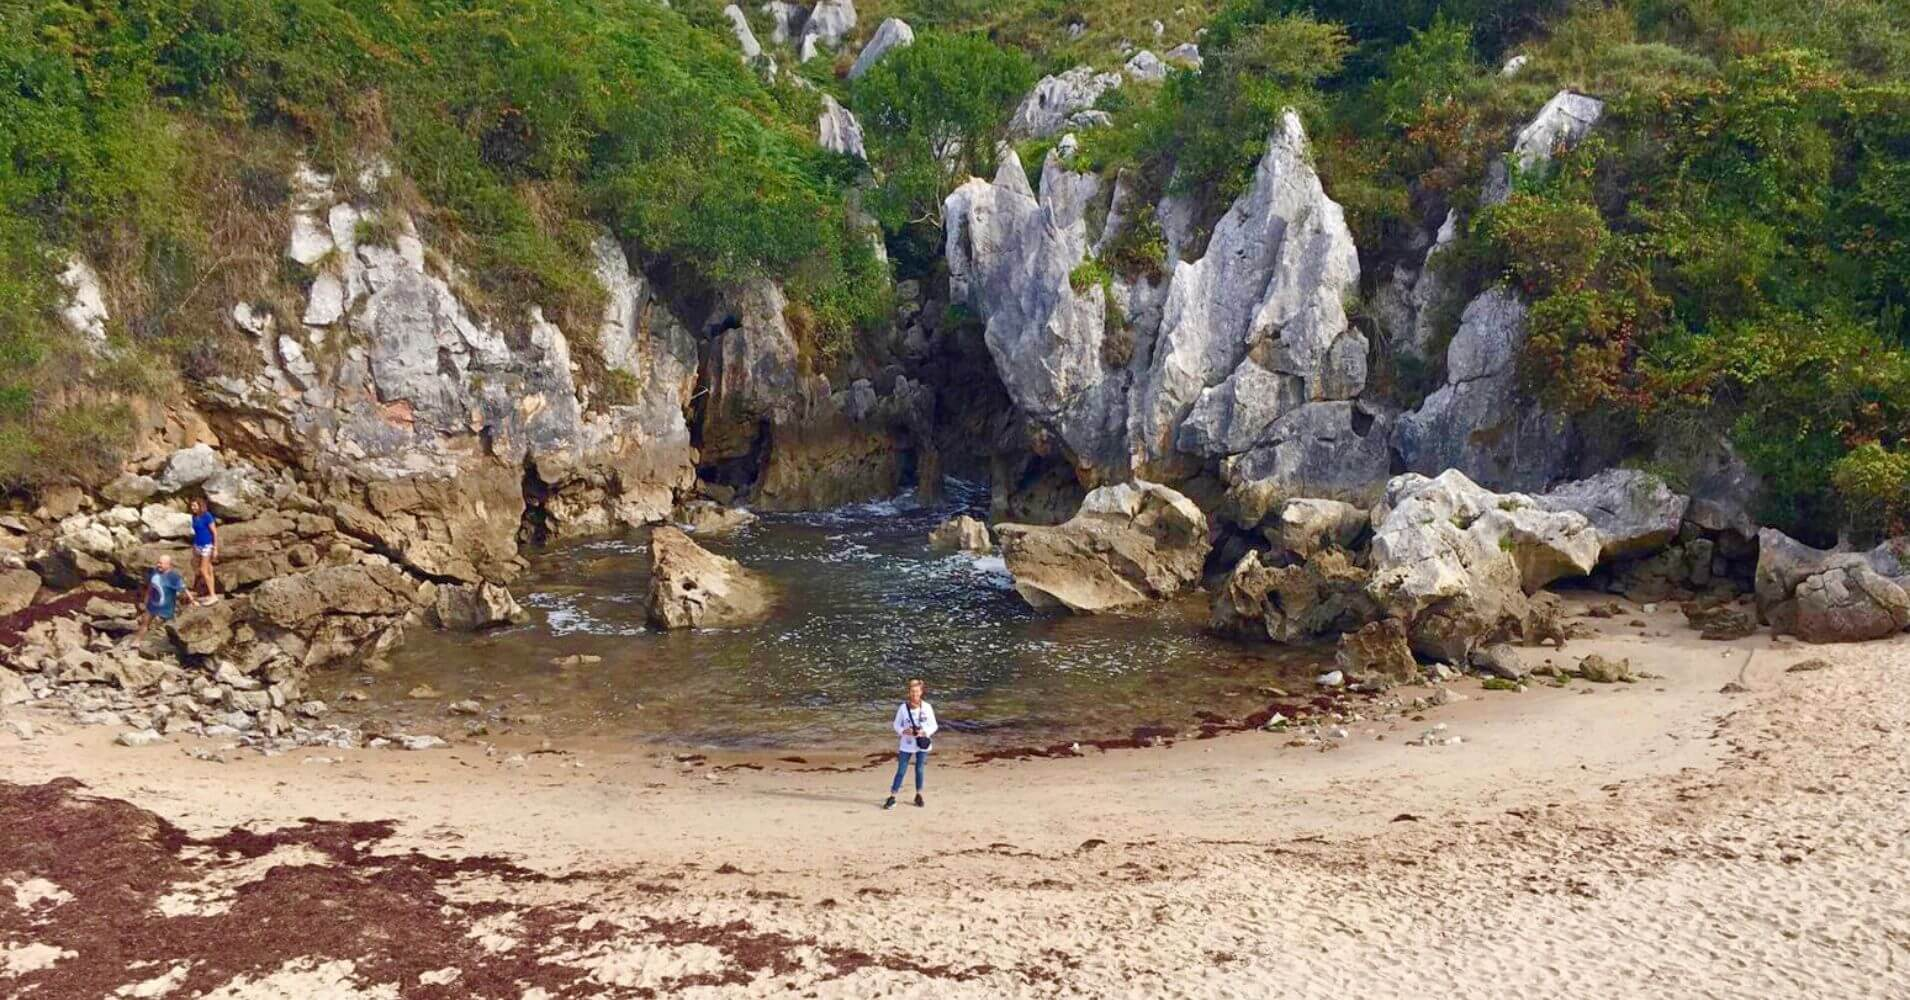 Playa de Gulpiyuri. Asturias Maravilla Natural.